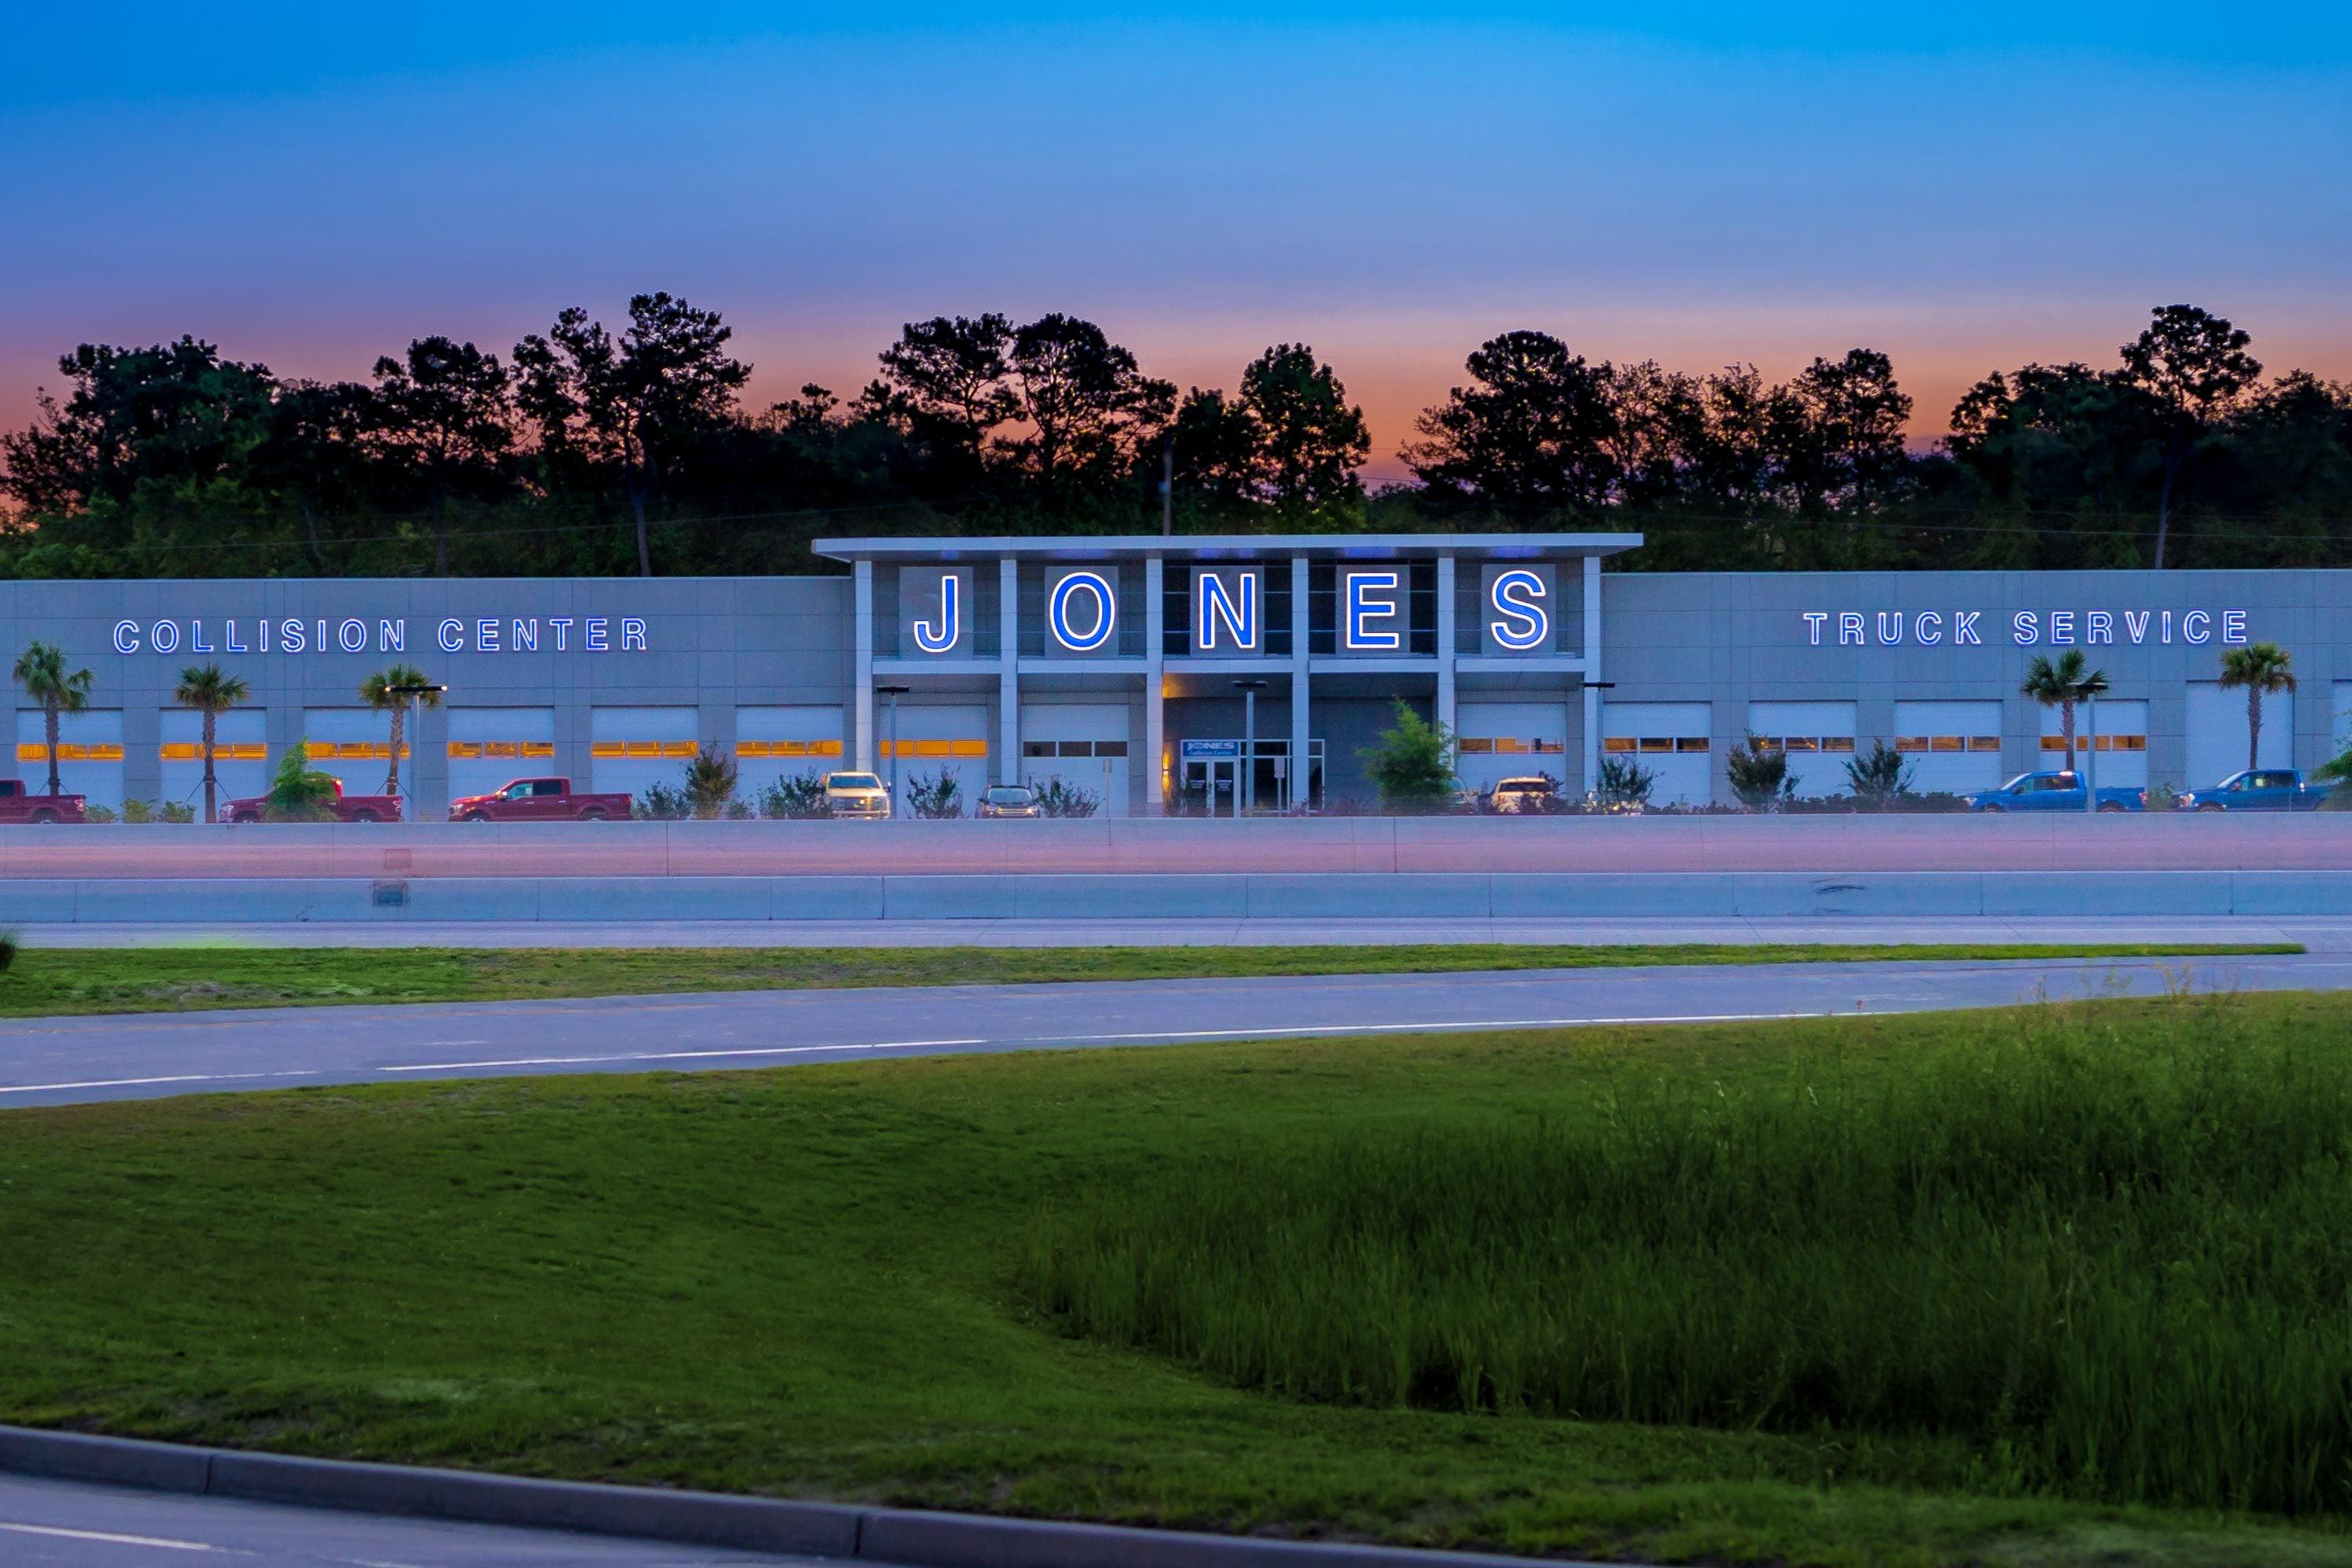 Jones Ford Collision Center